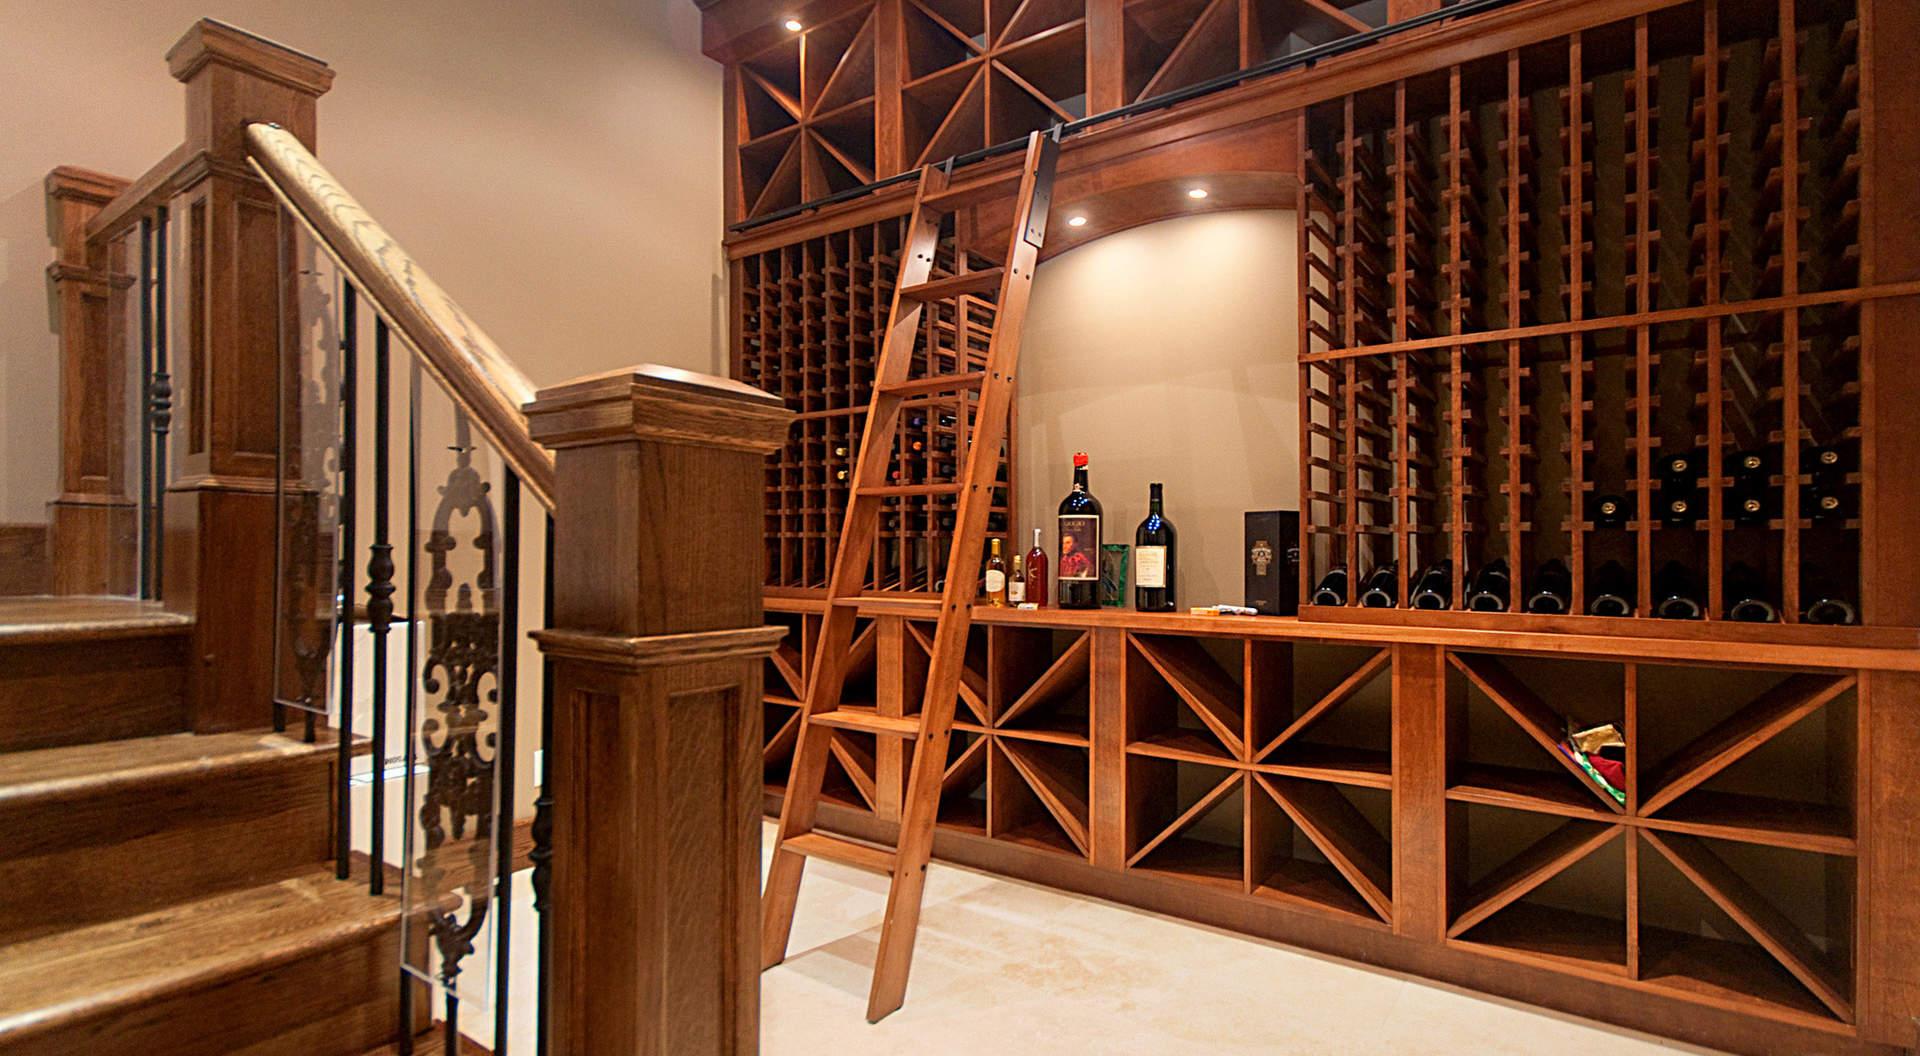 Gorgeous Waterfront ... & Dundarave Wine Cellar - Natashamillerweb